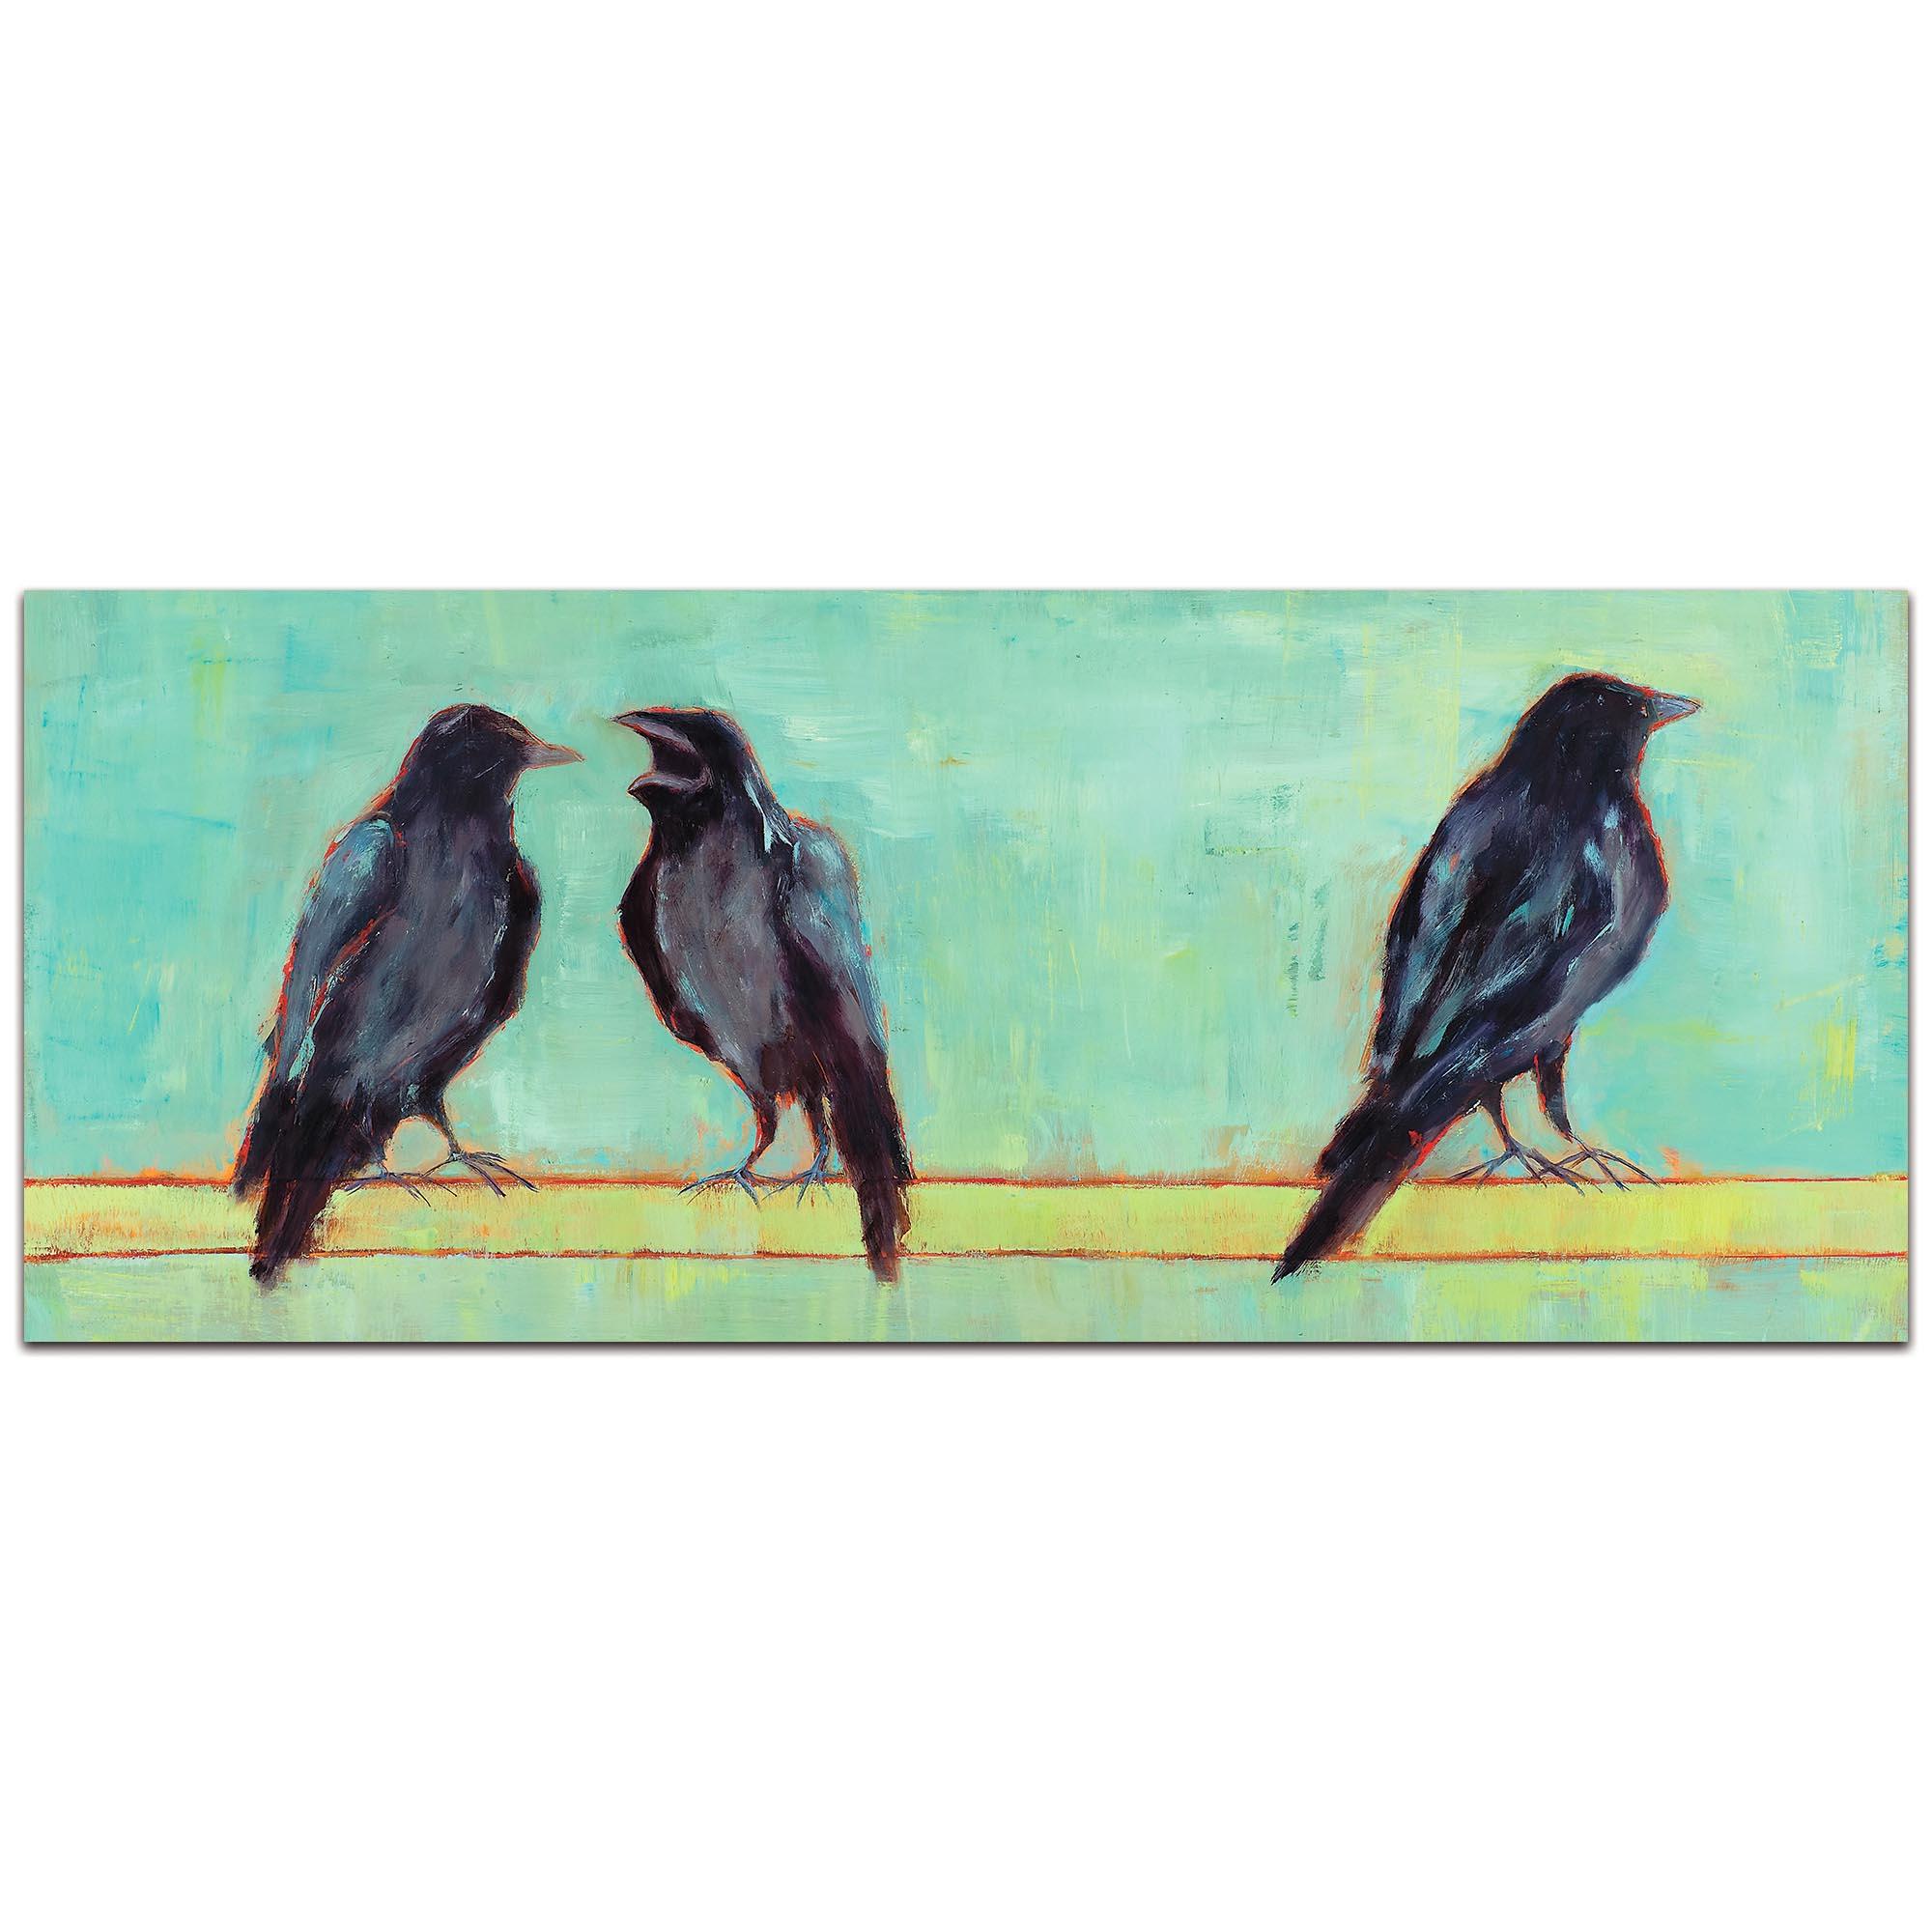 Contemporary Wall Art 'Crow Bar 2 v2' - Urban Birds Decor on Metal or Plexiglass